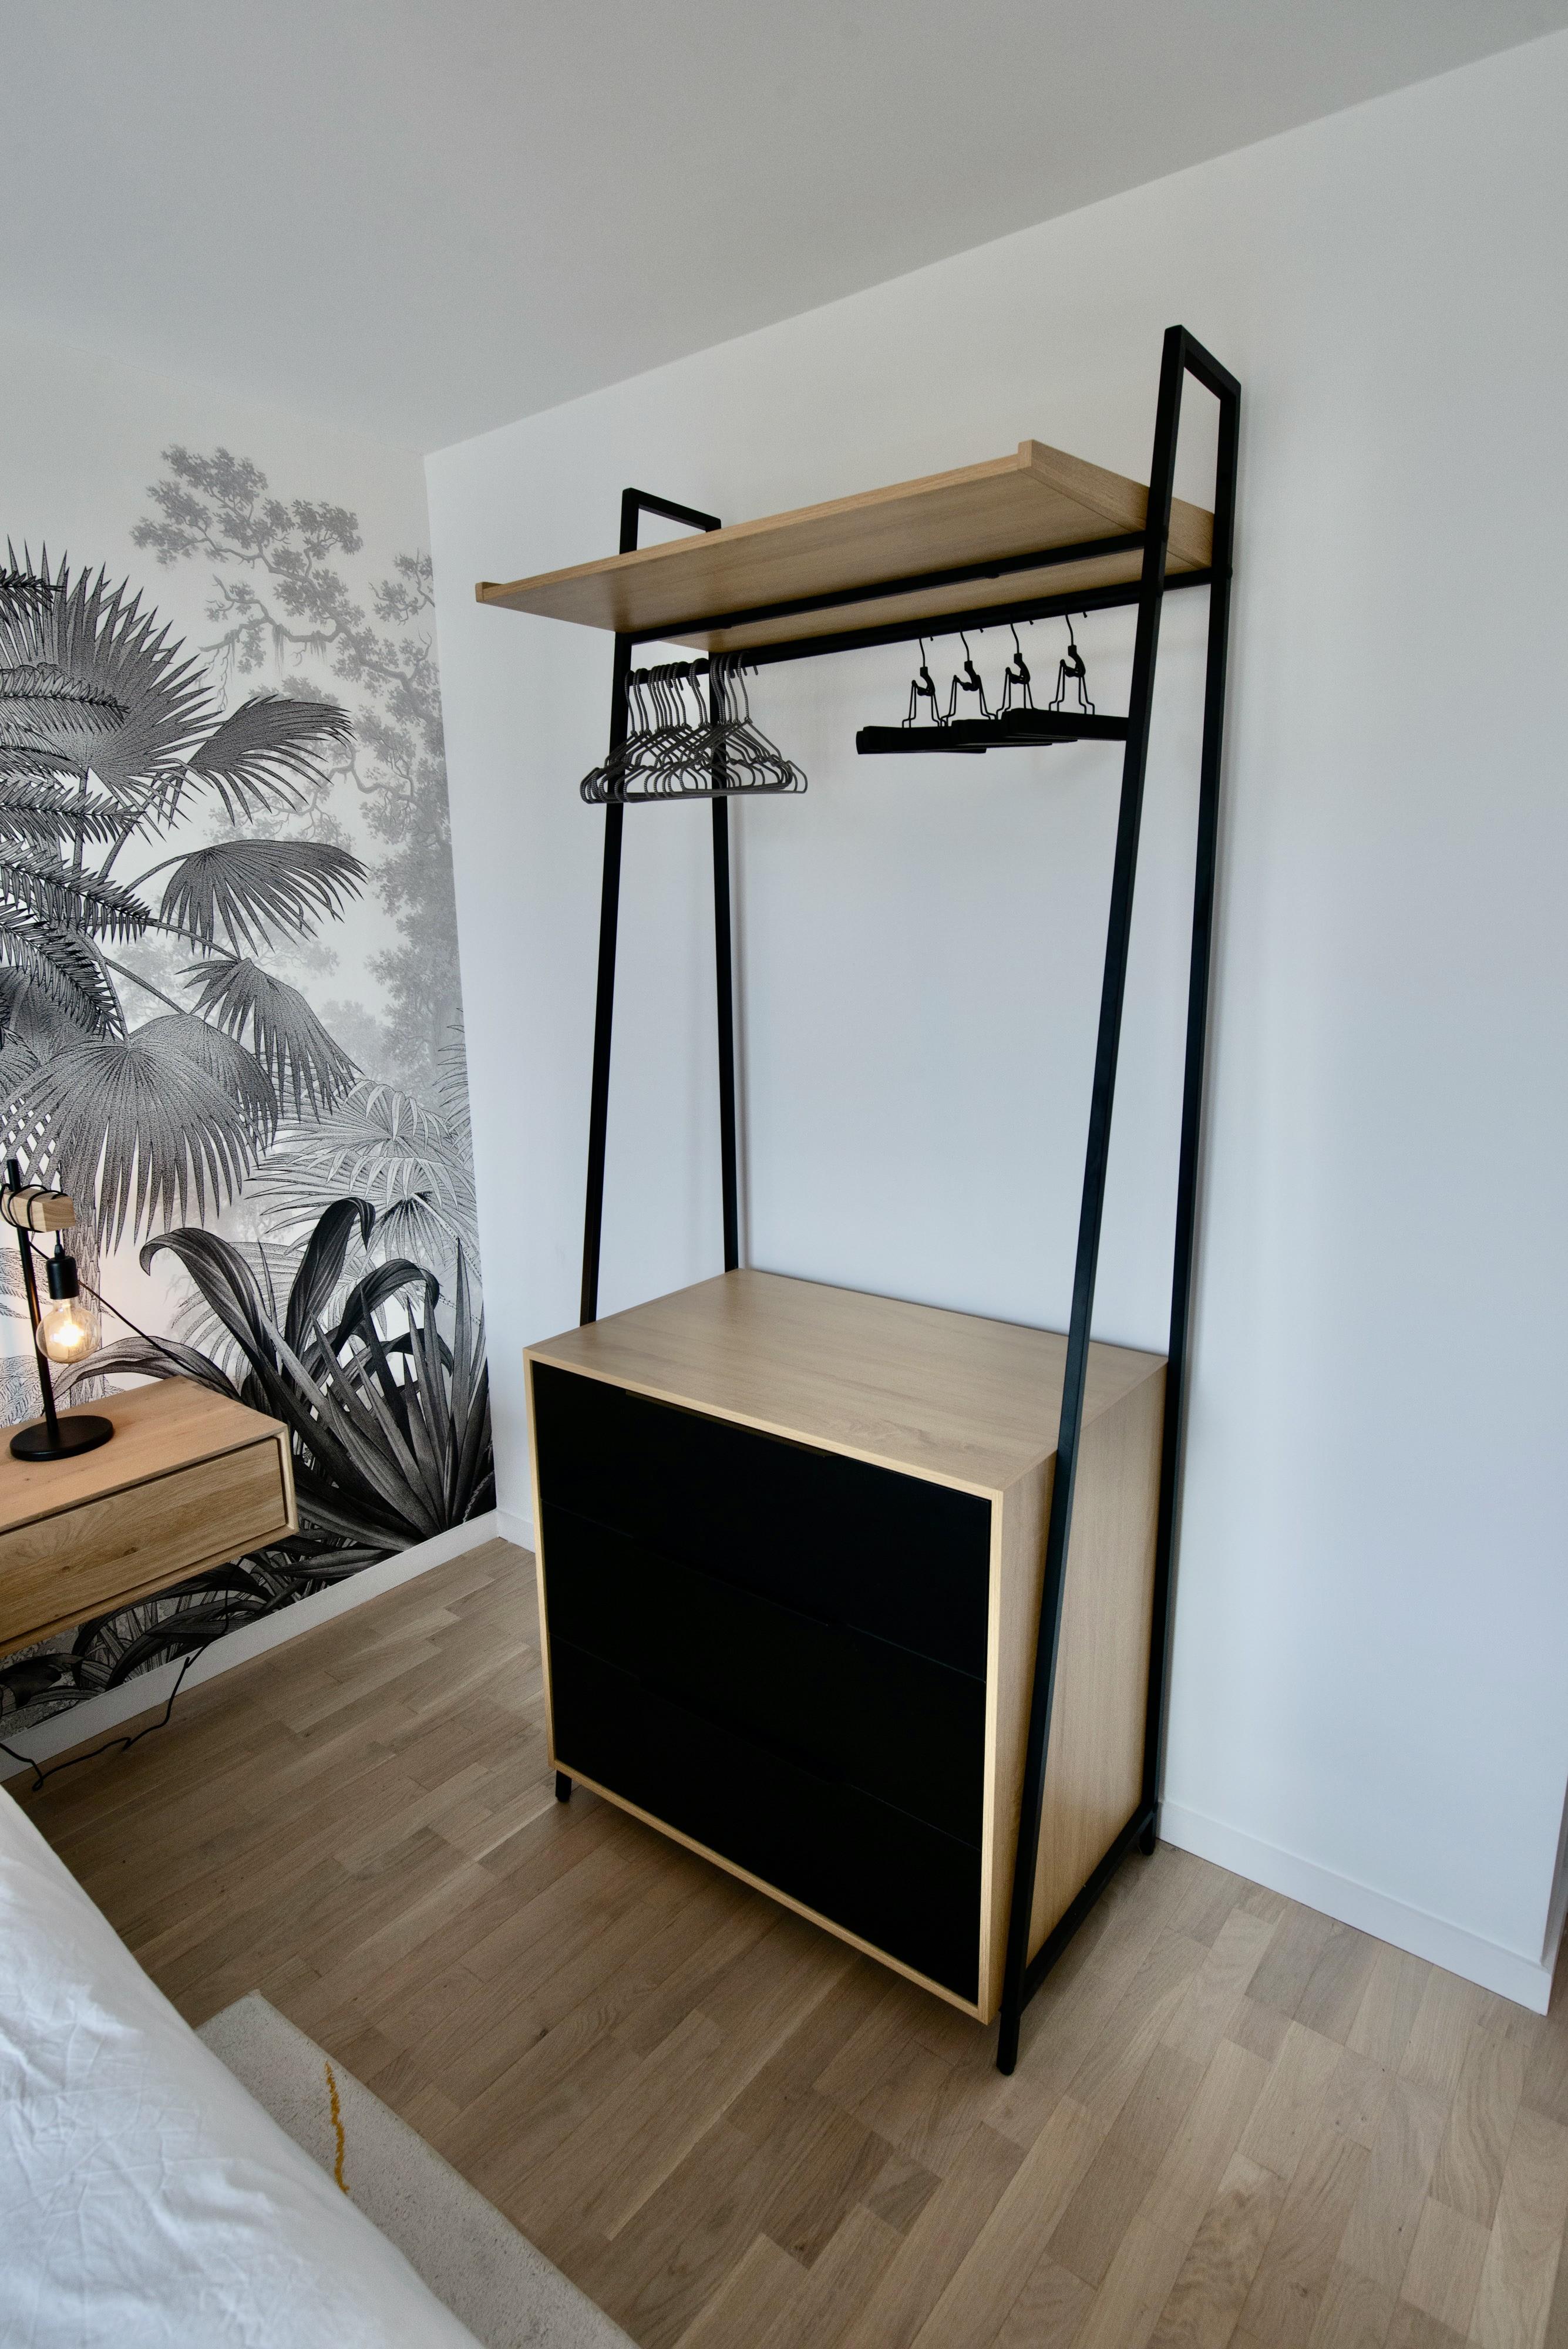 Chessy meuble de rangement bois et noir